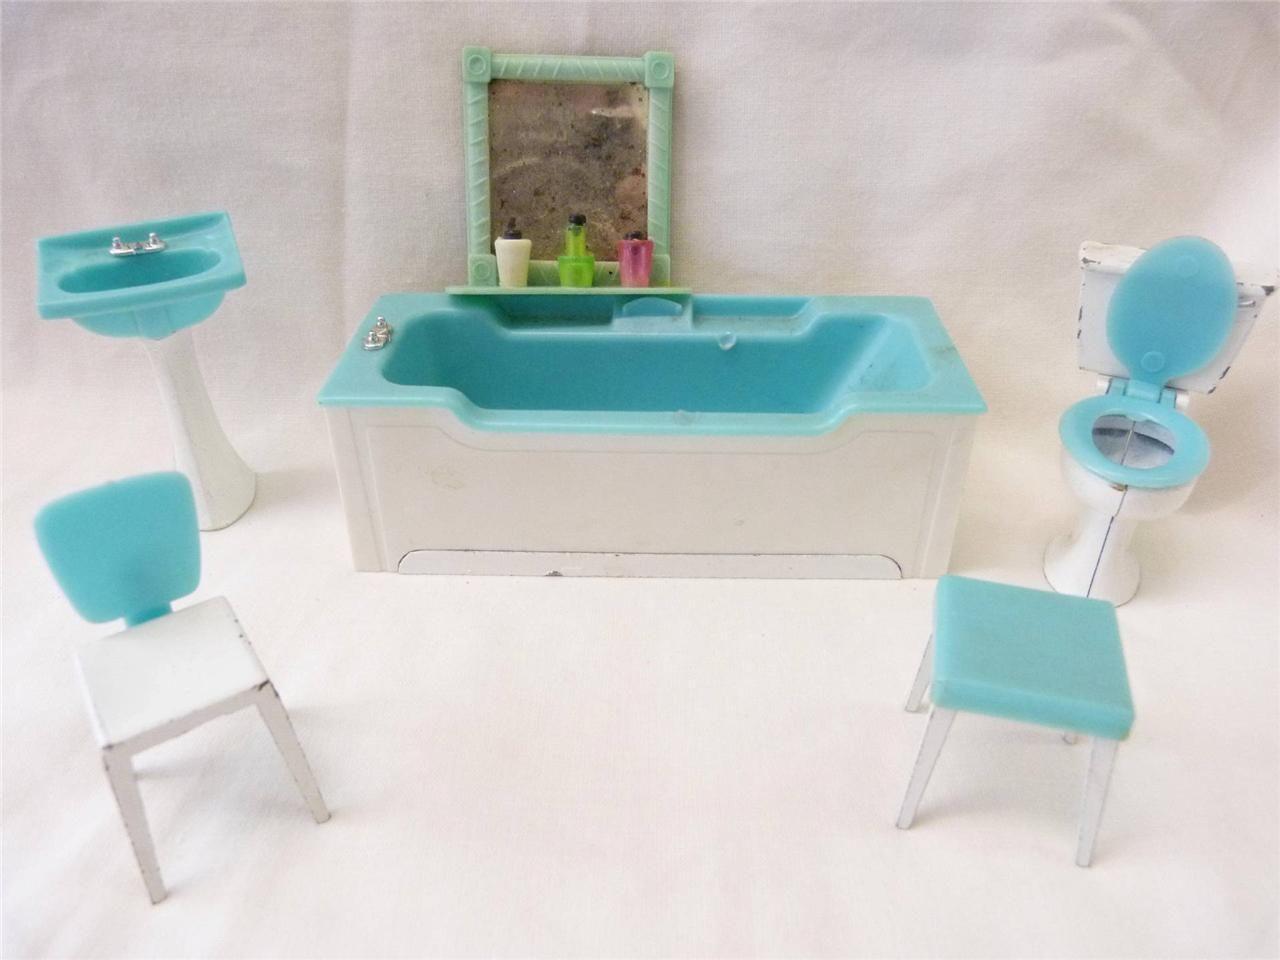 Wonderful Traing Spot On Metal U0026 Plastic 1950s Retro Dolls House Bathroom Furniture |  EBay